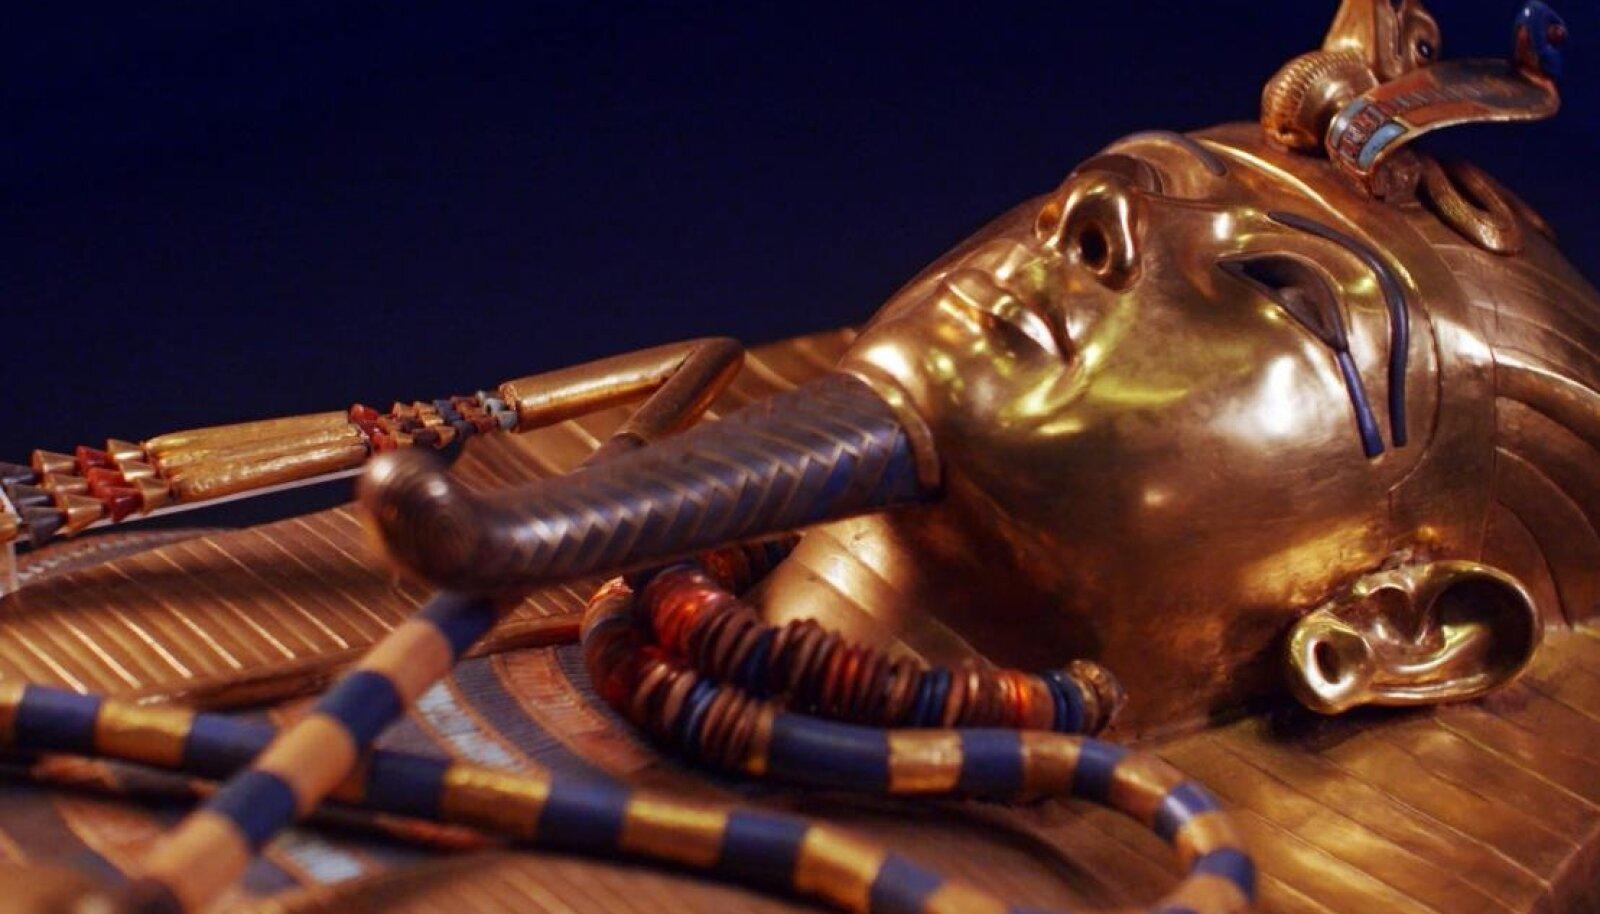 Tutanhamoni surimask